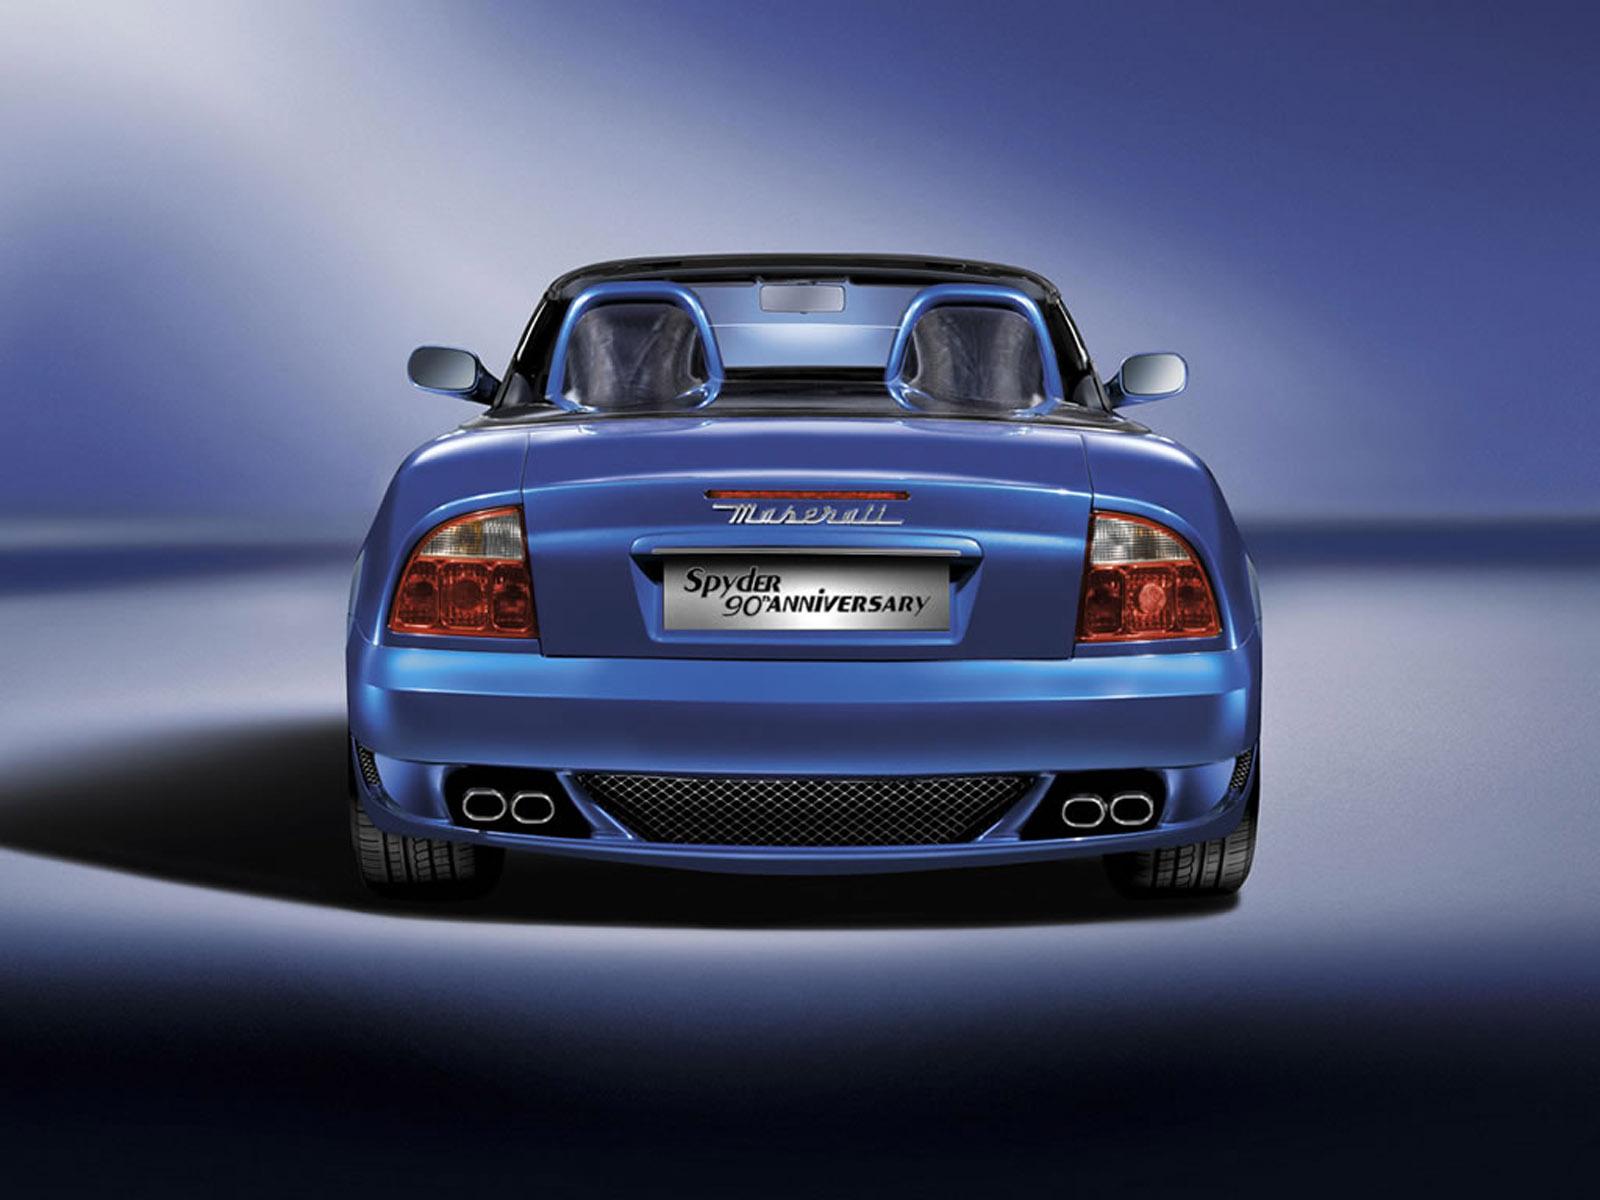 https://www.automobilesreview.com/img/2004-maserati-spyder-90th-anniversary/2004-maserati-spyder-90th-anniversary-05.jpg